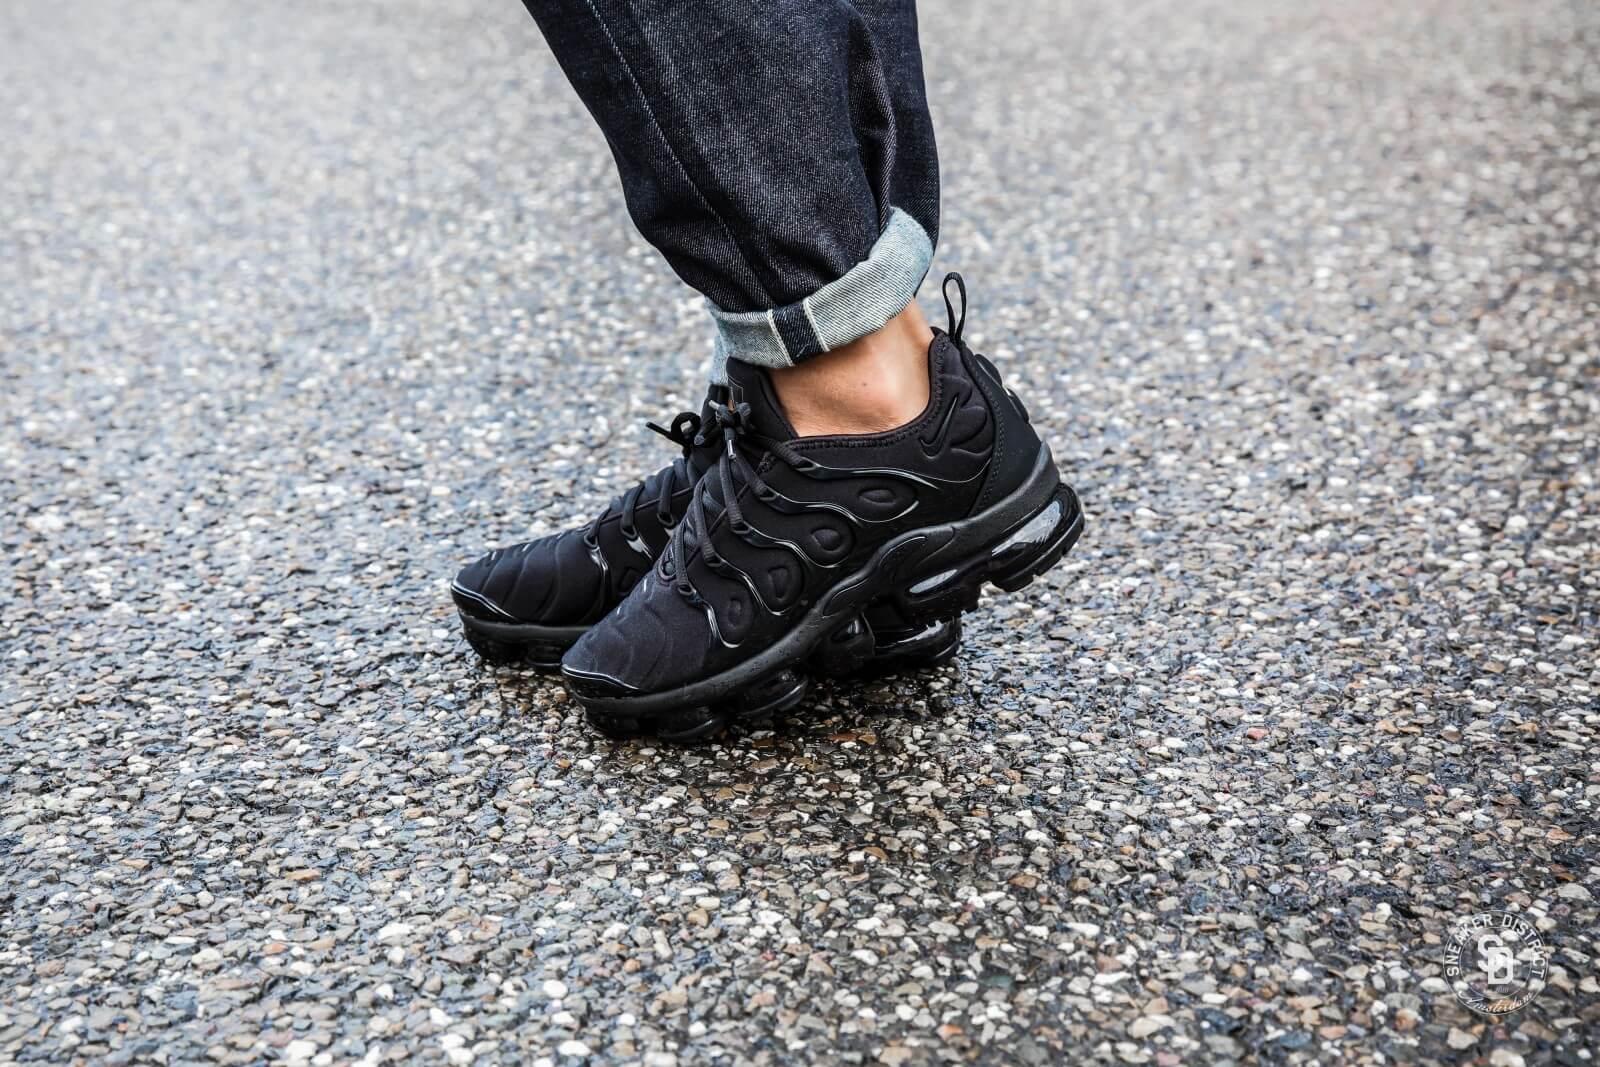 Nike Air Vapormax Plus BlackDark Grey 924453 004